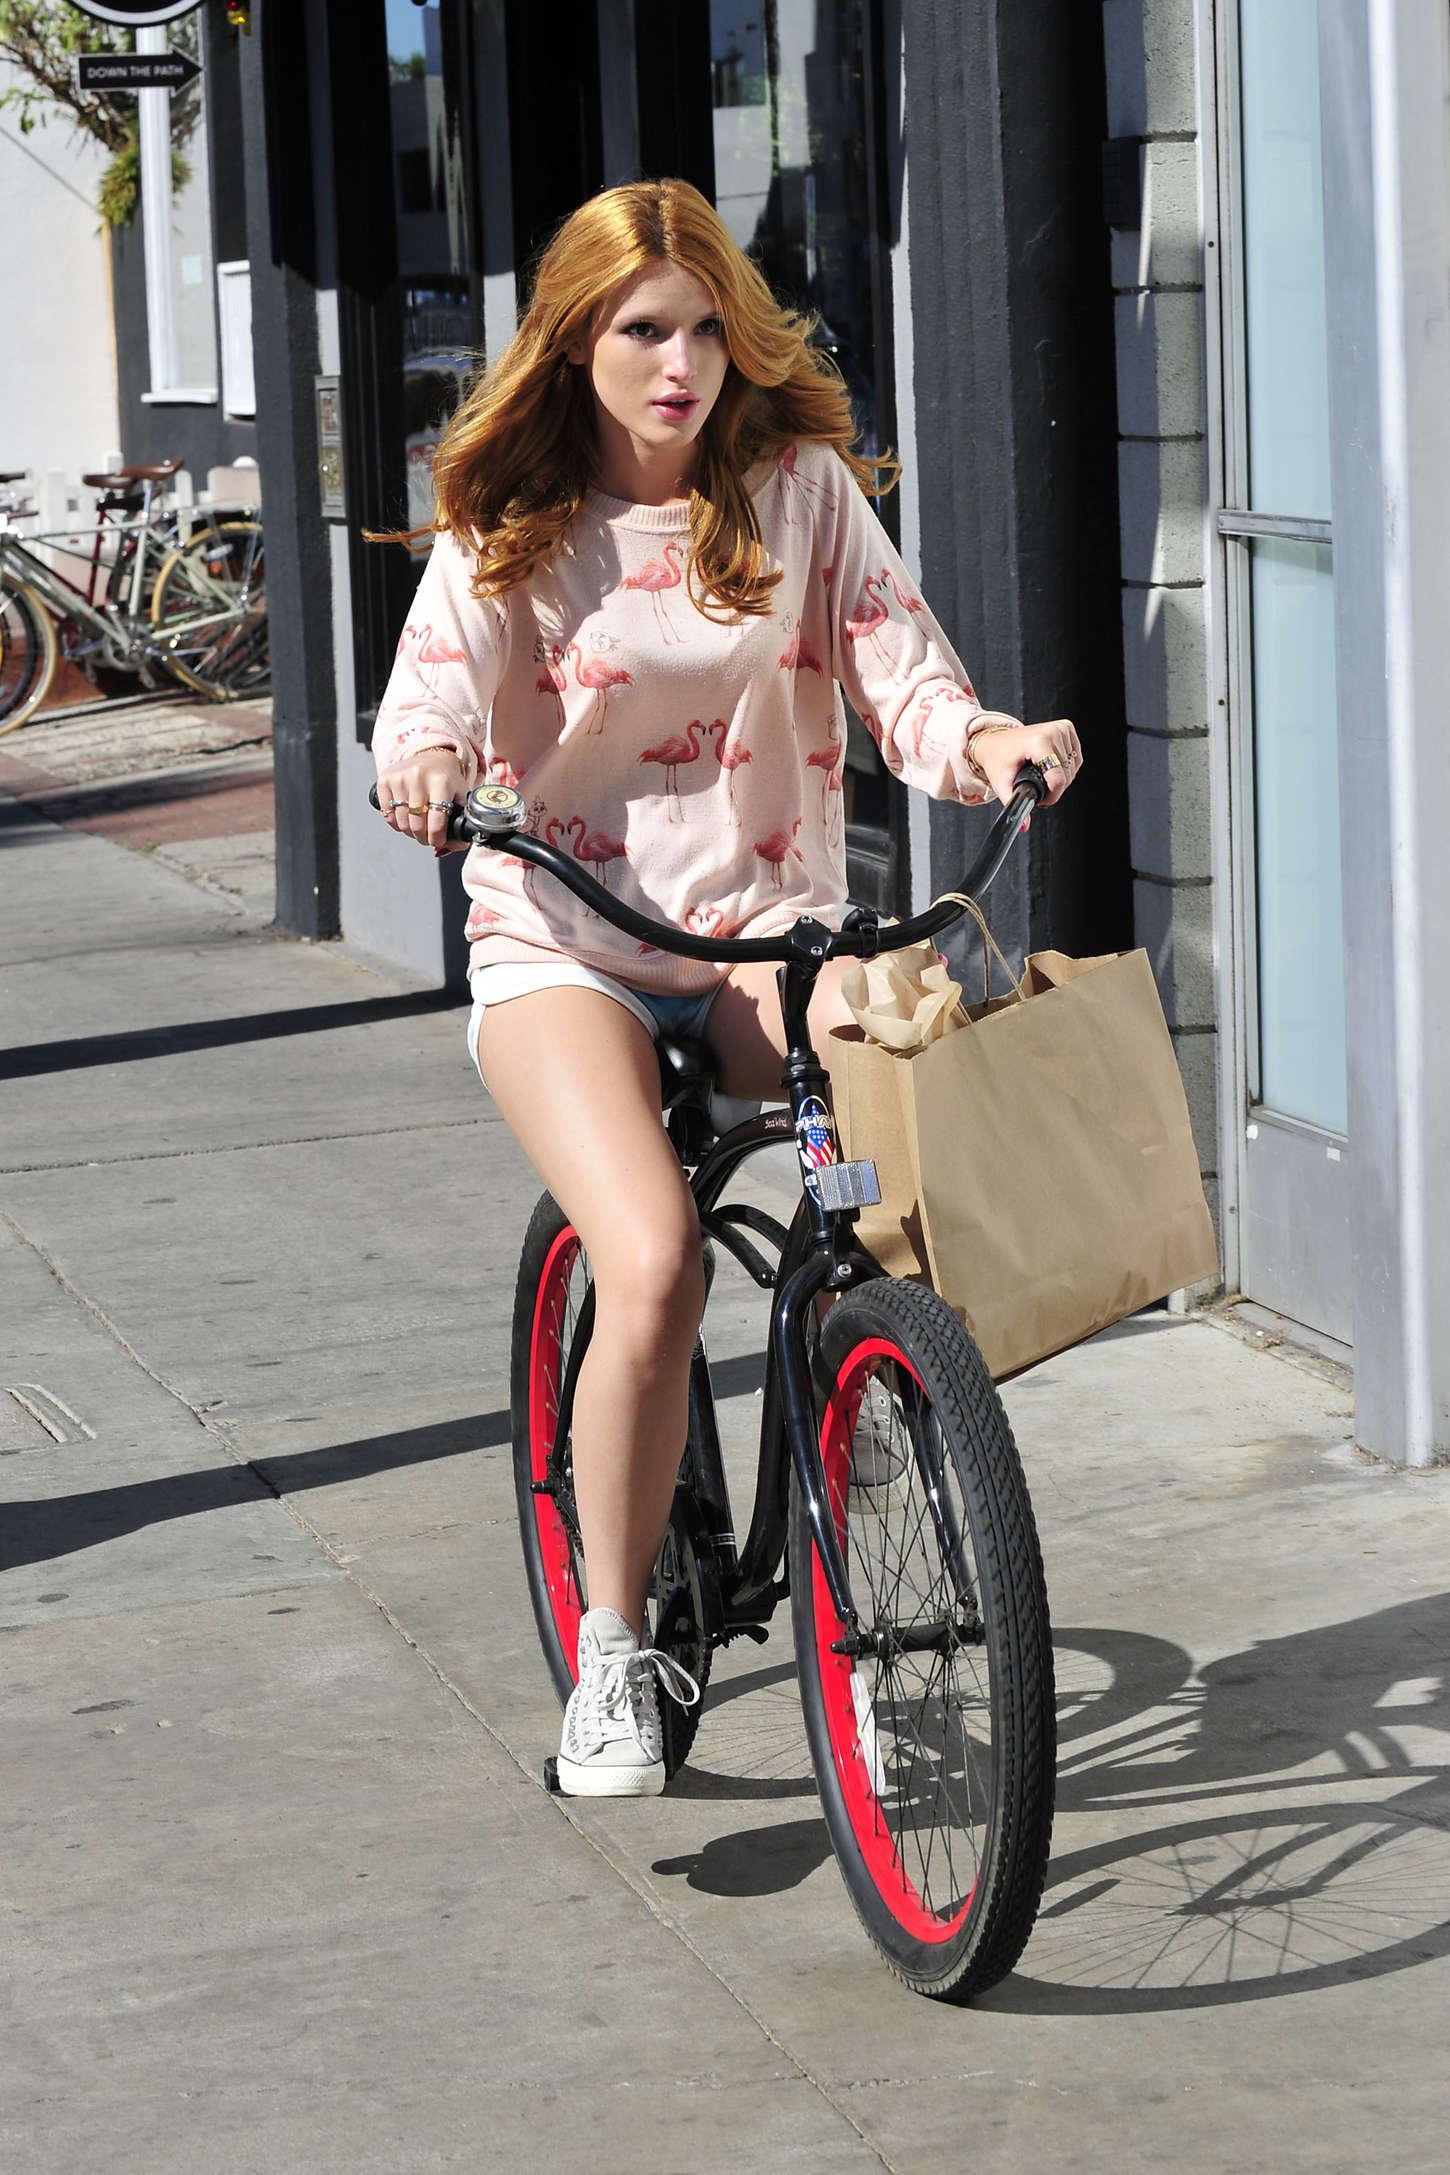 Bella Thorne 2014 : Bella Thorne: Michael Simon Photoshoot 2014 -13